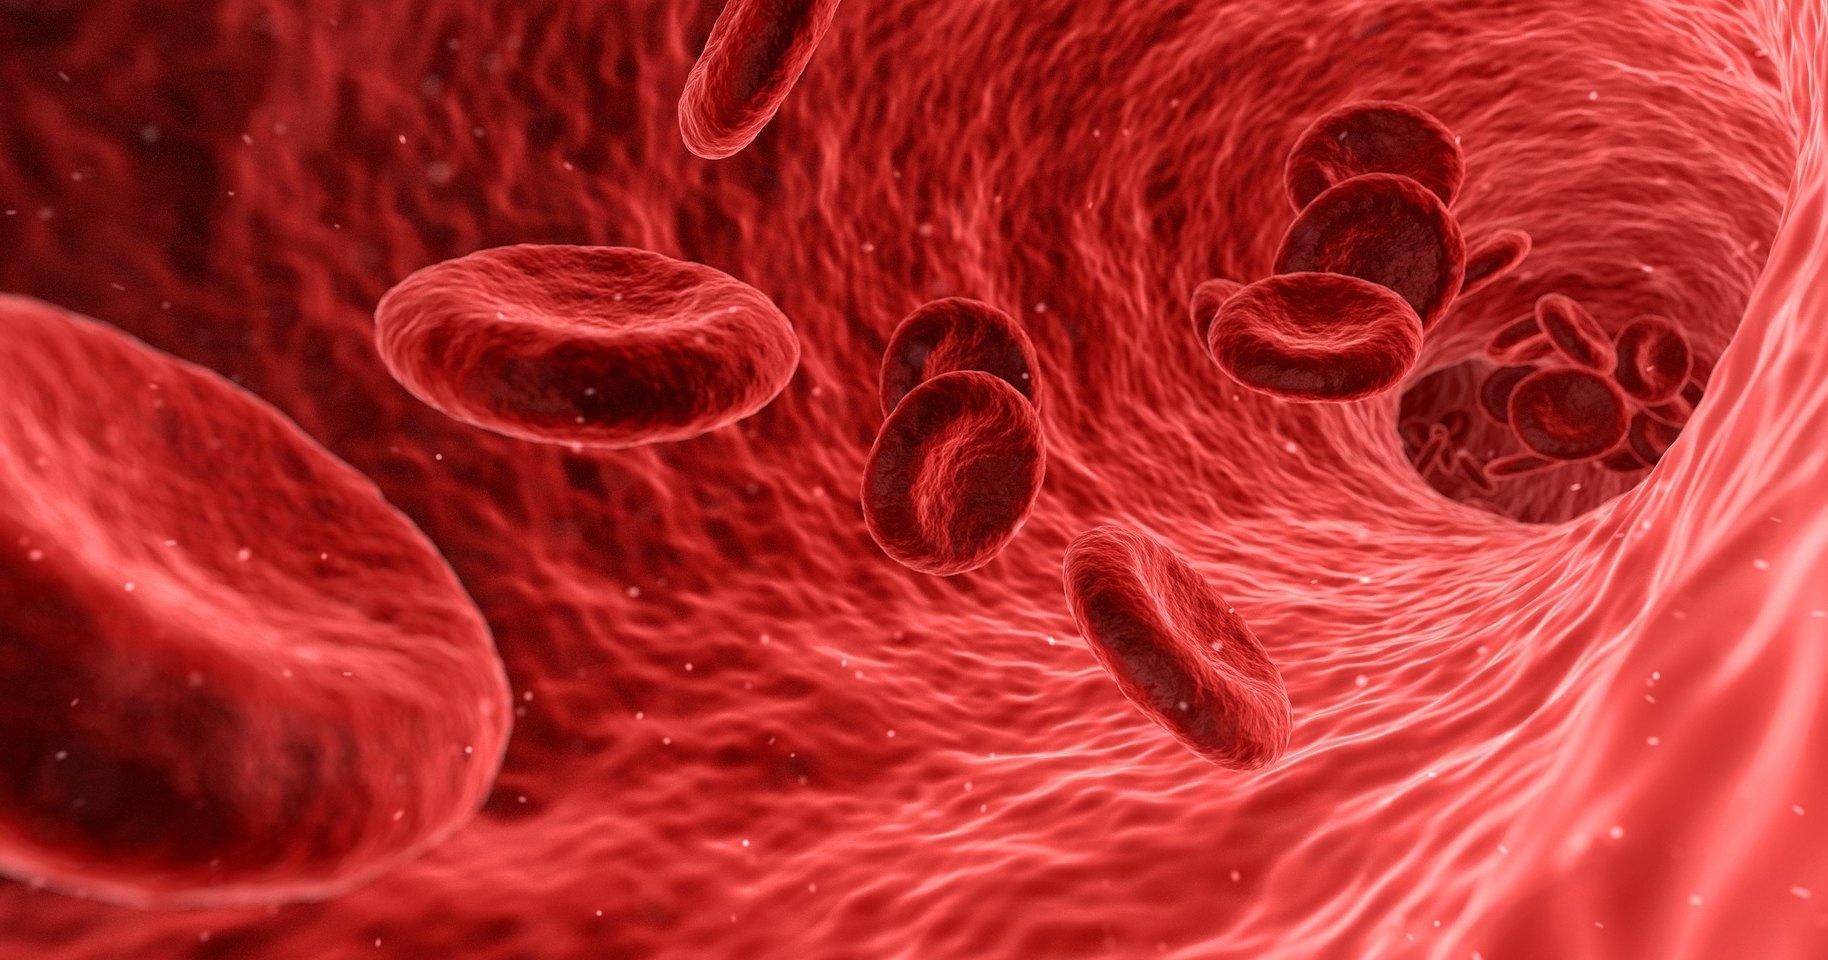 Группа крови: какие болезни грозят каждому «типу»